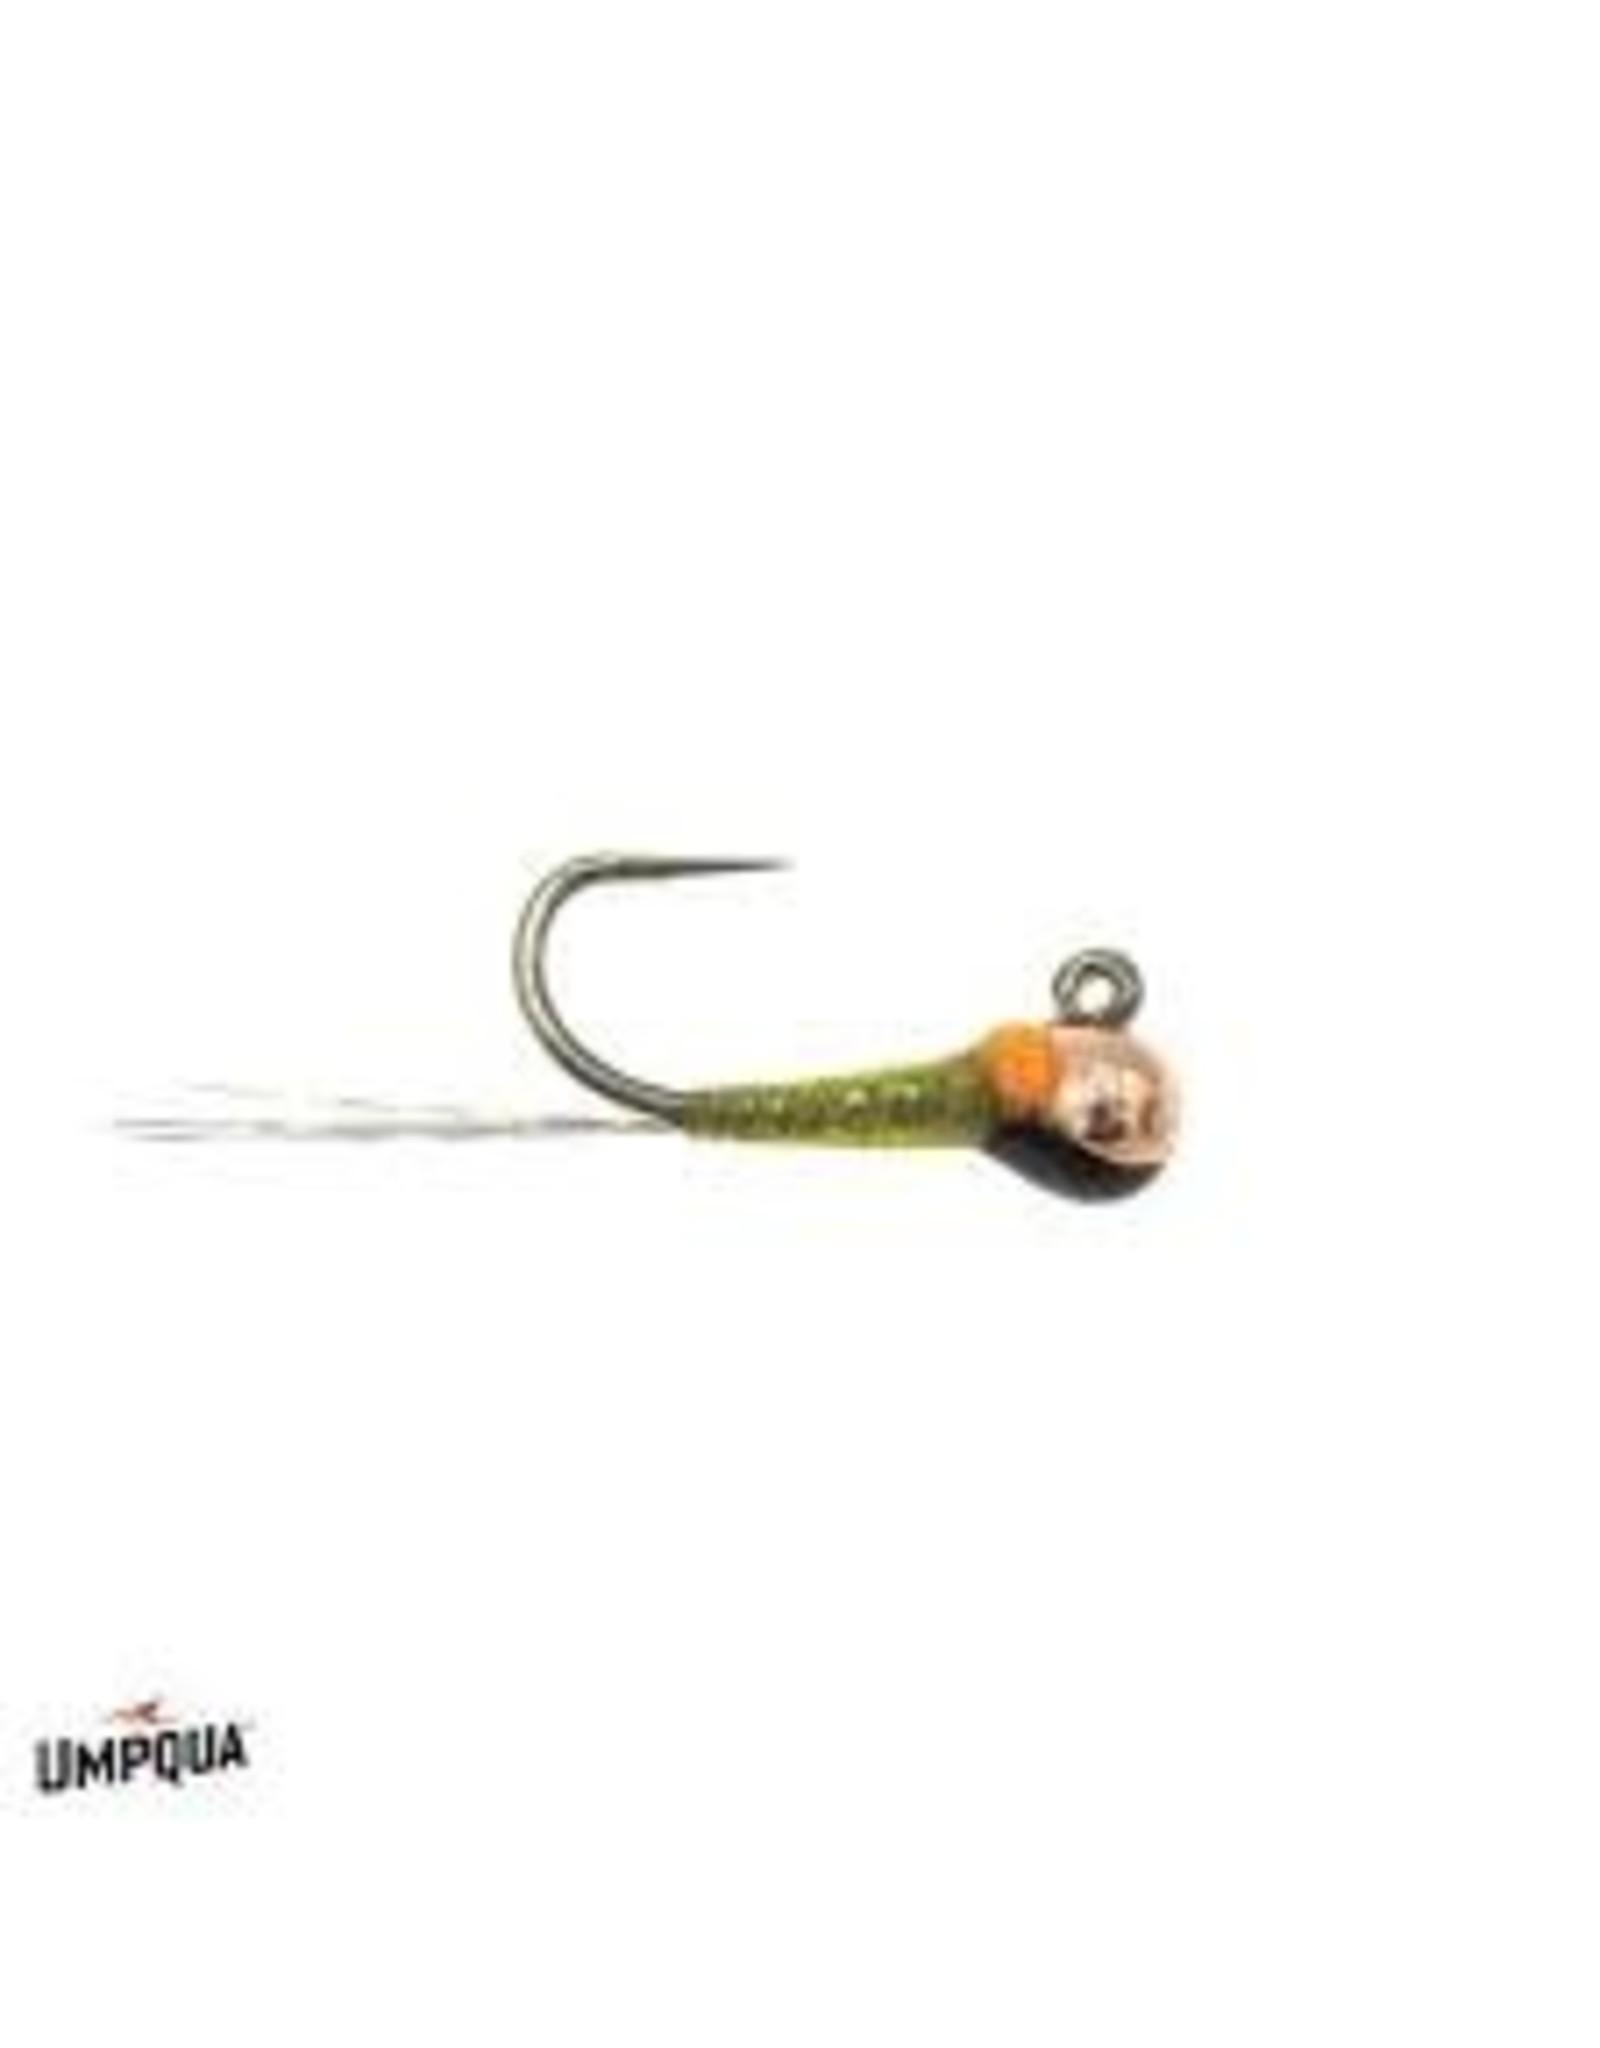 Umpqua Quill Bomb Olive 2.5    18